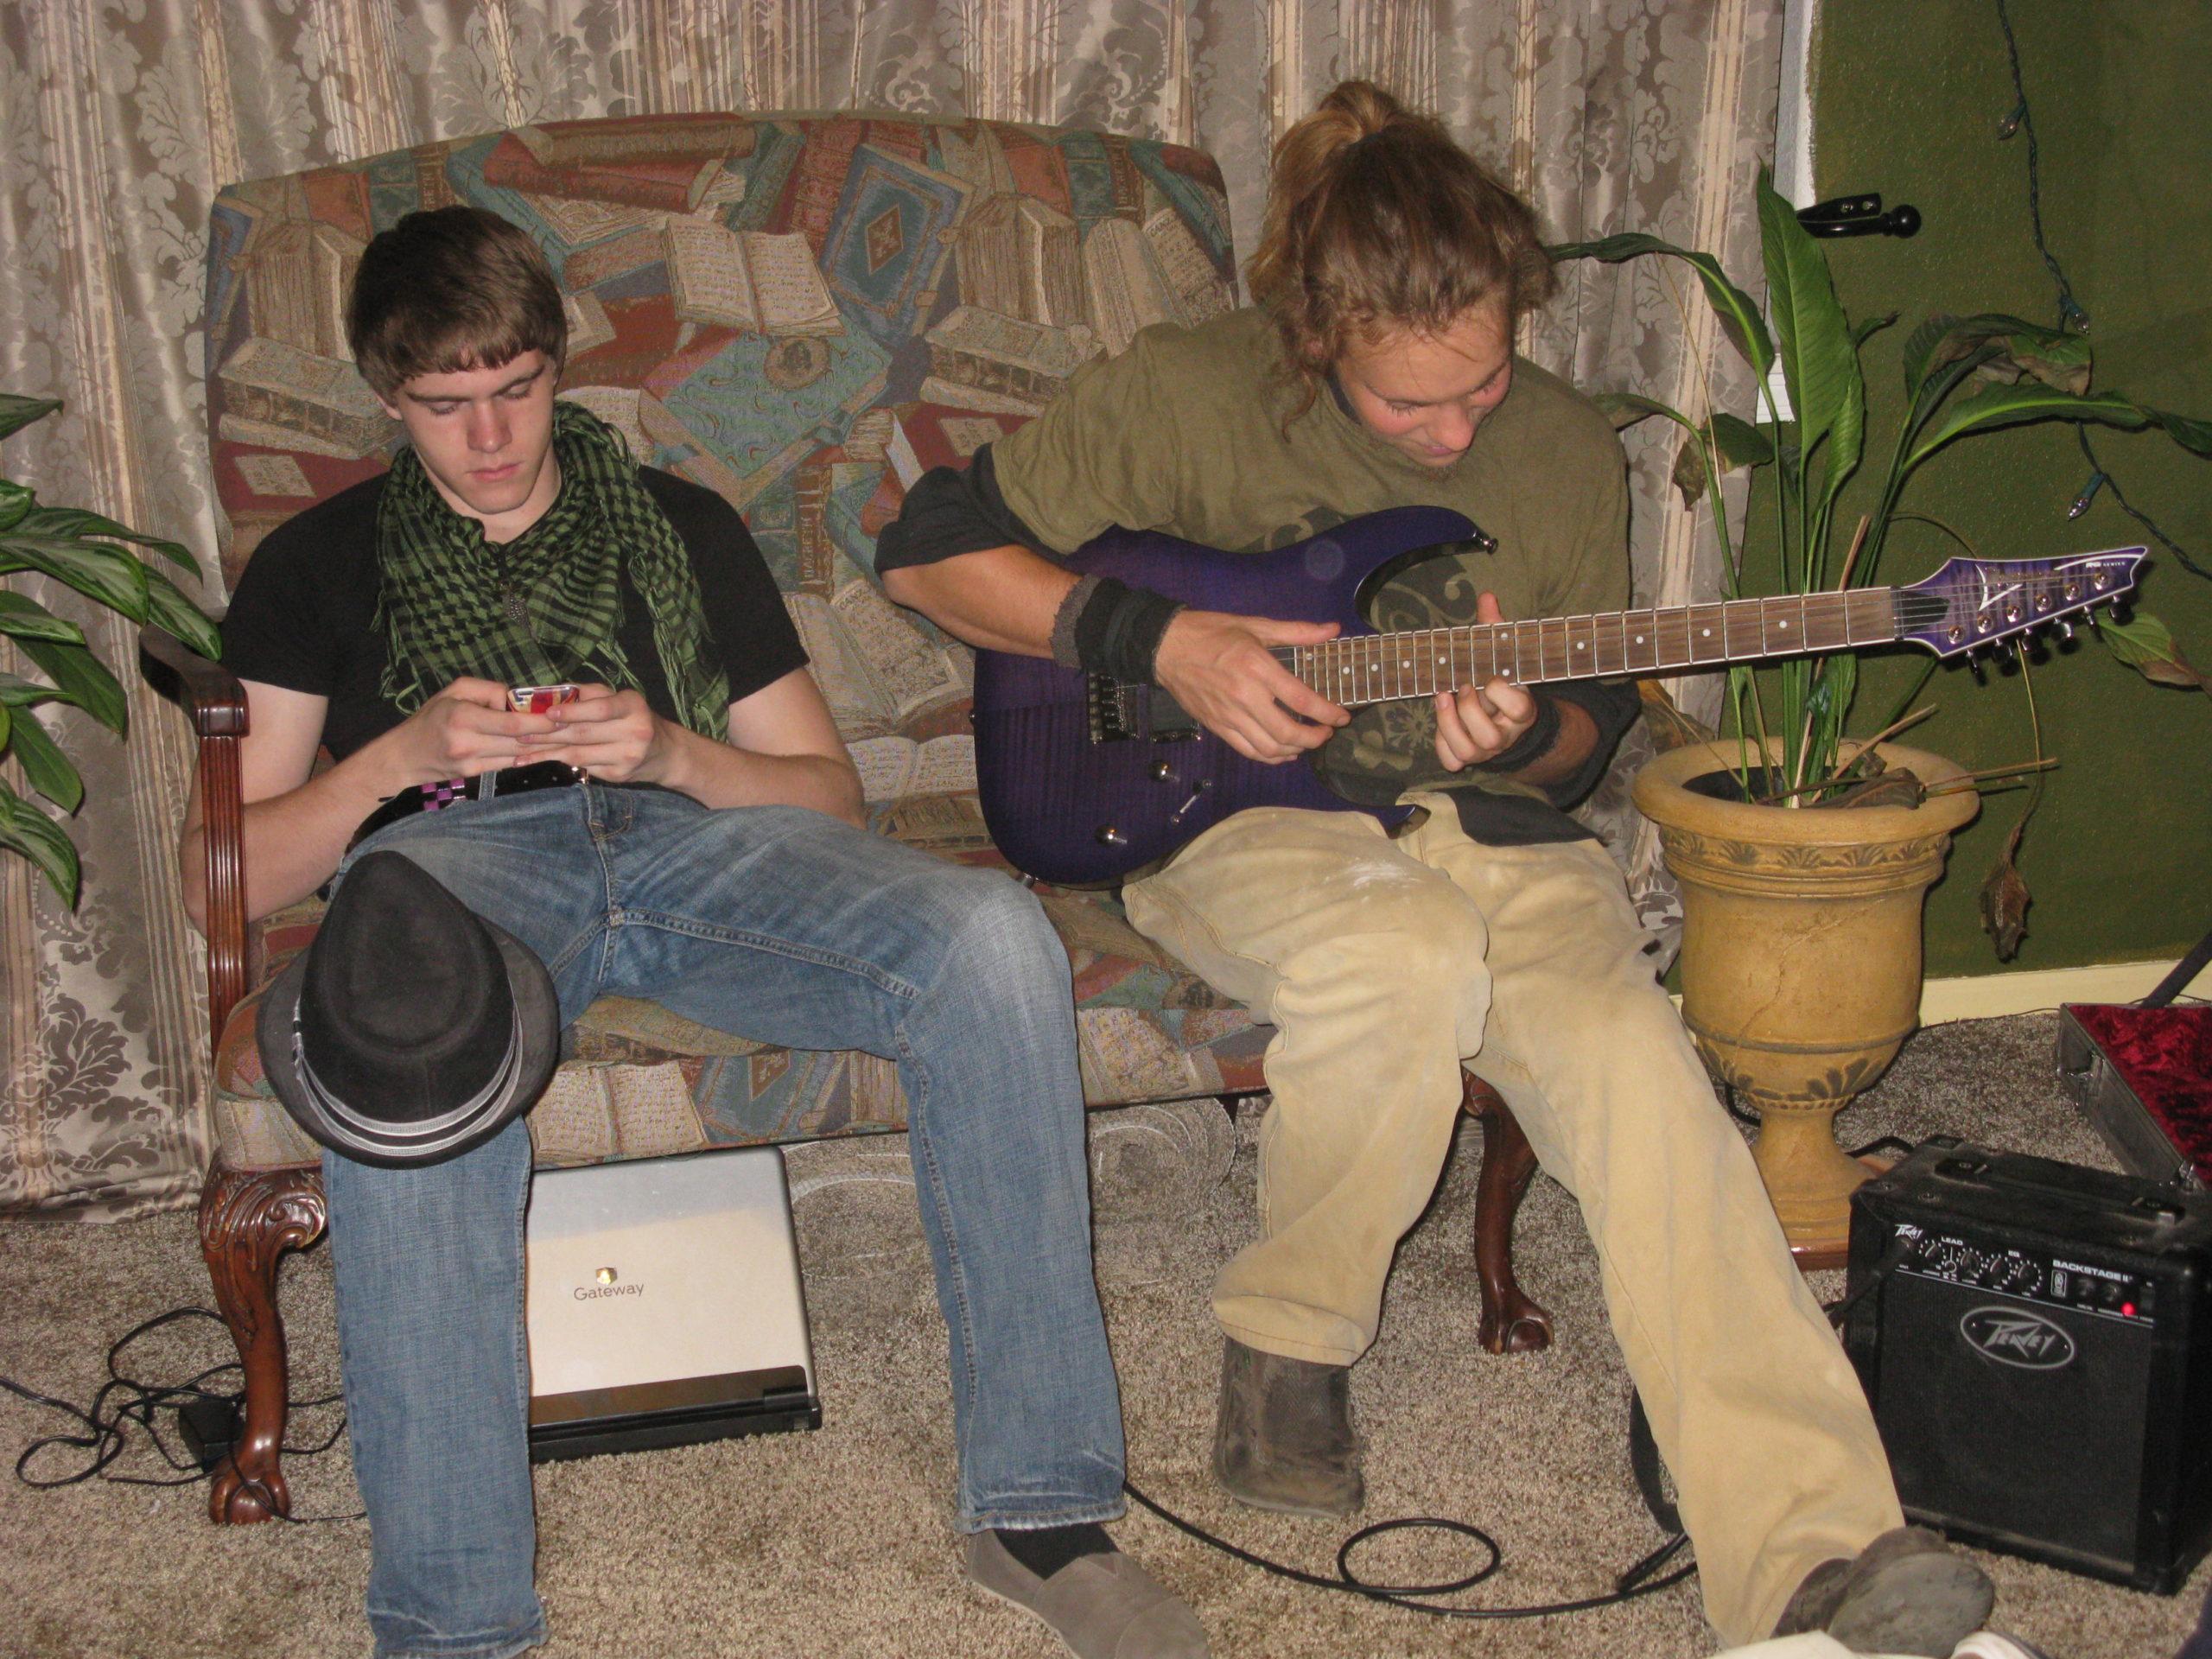 Daniel playing guitar